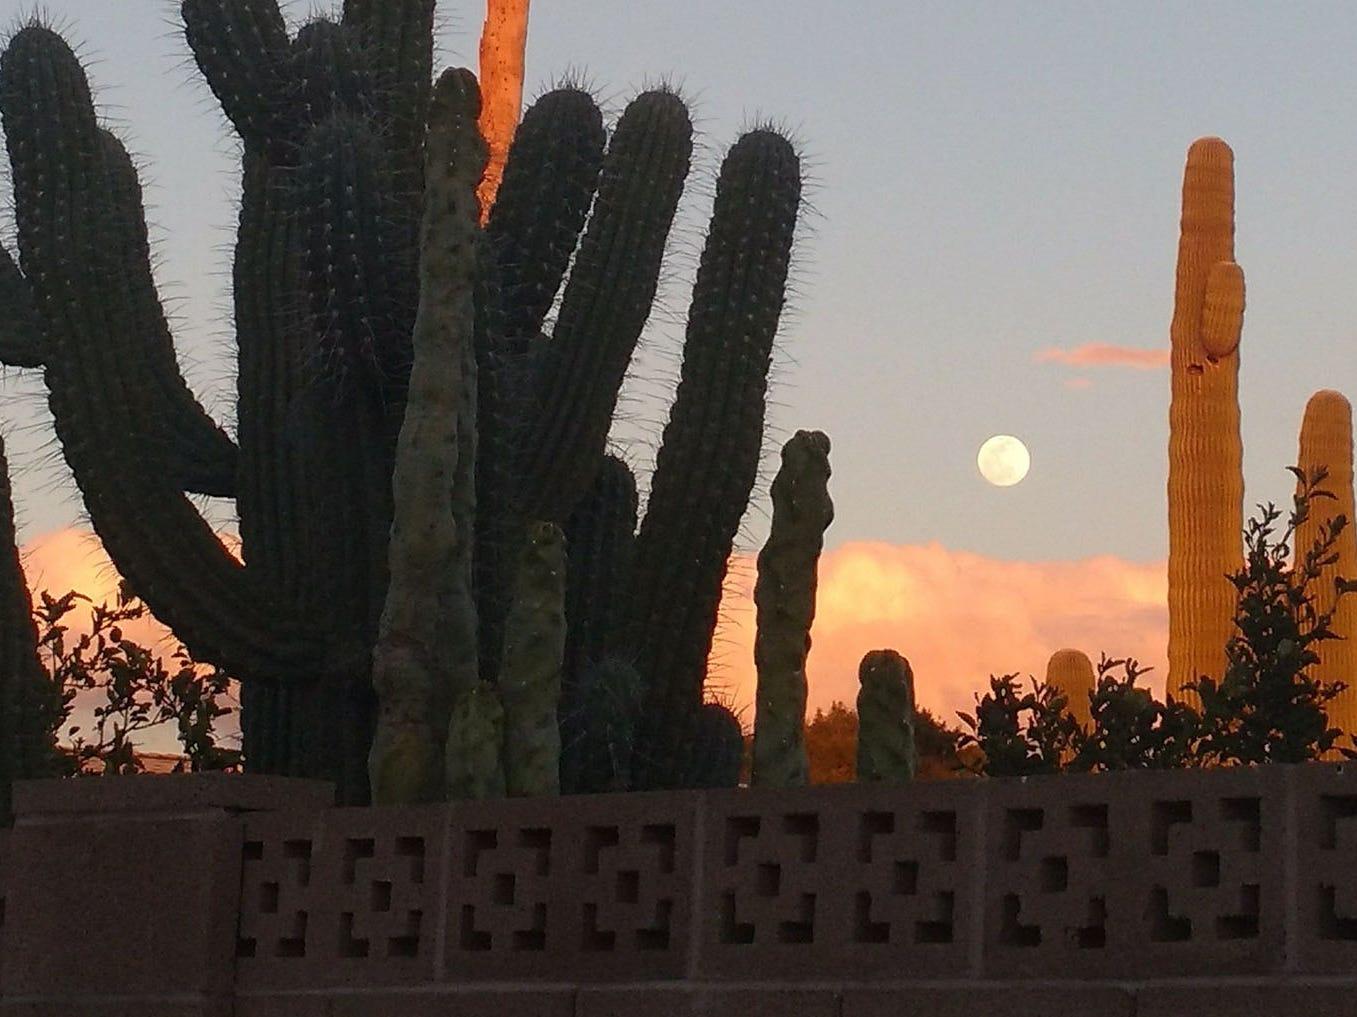 Sun City sunset and moonrise.